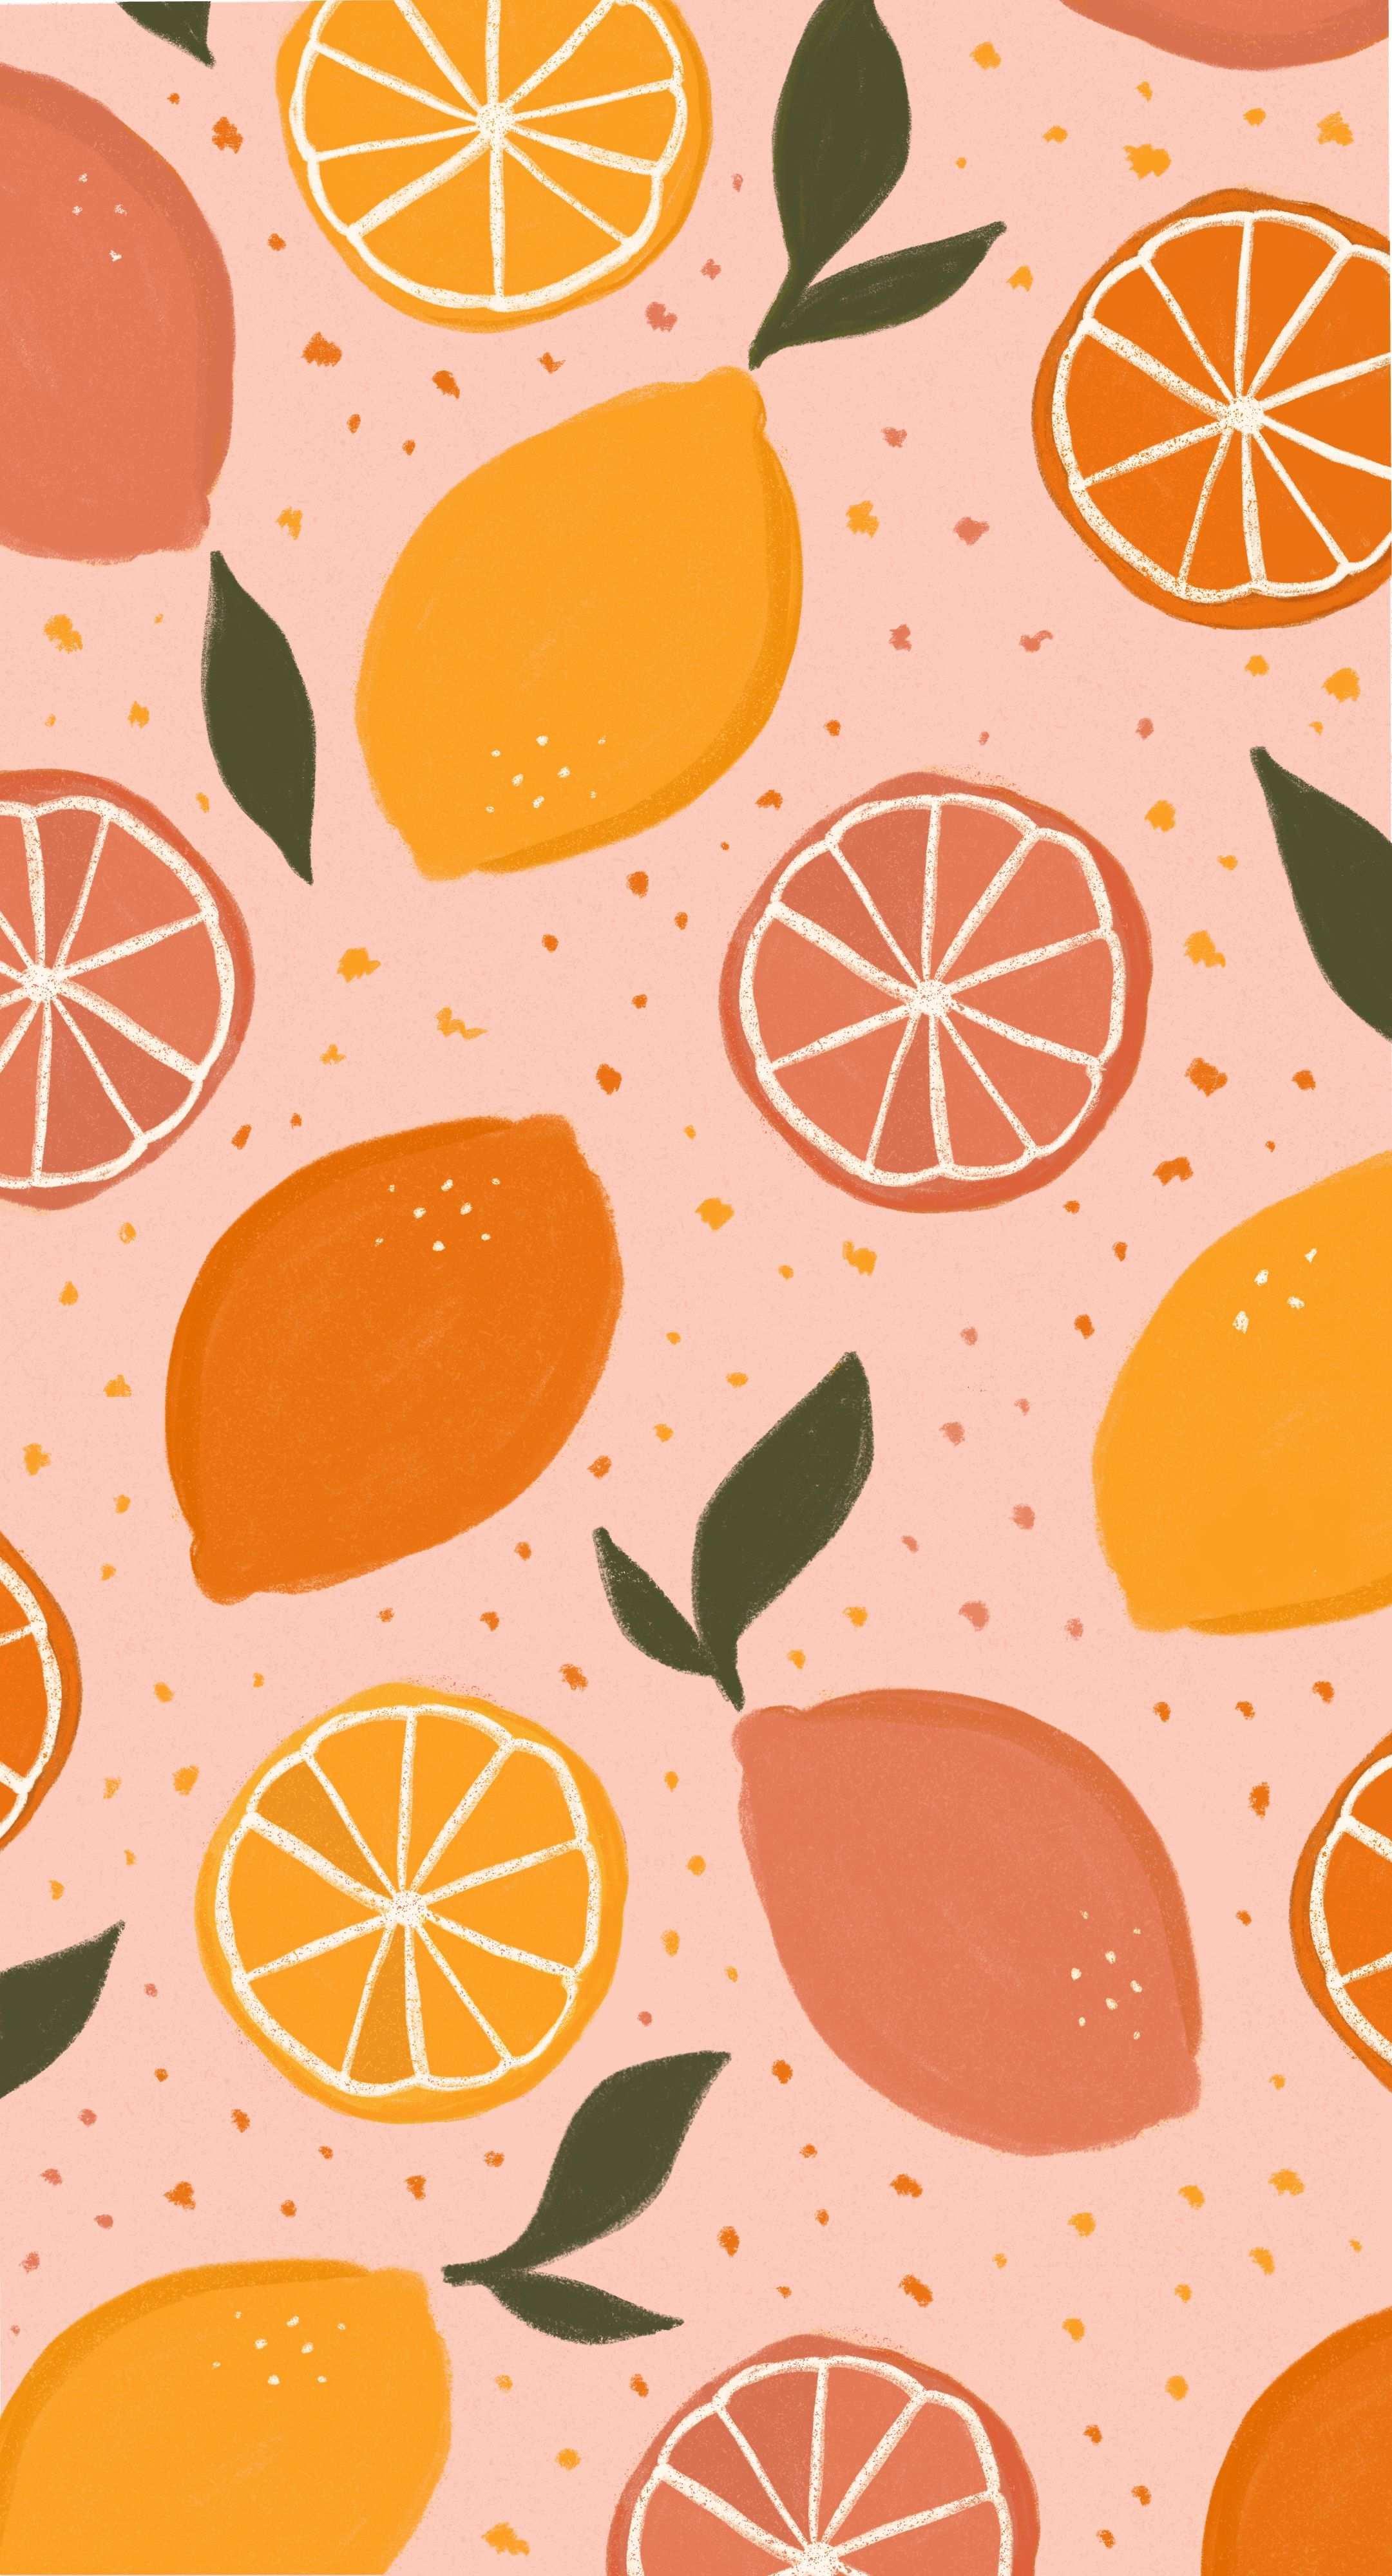 Lemon Pattern Illustration Cute Patterns Wallpaper Fruit Wallpaper Art Wallpaper